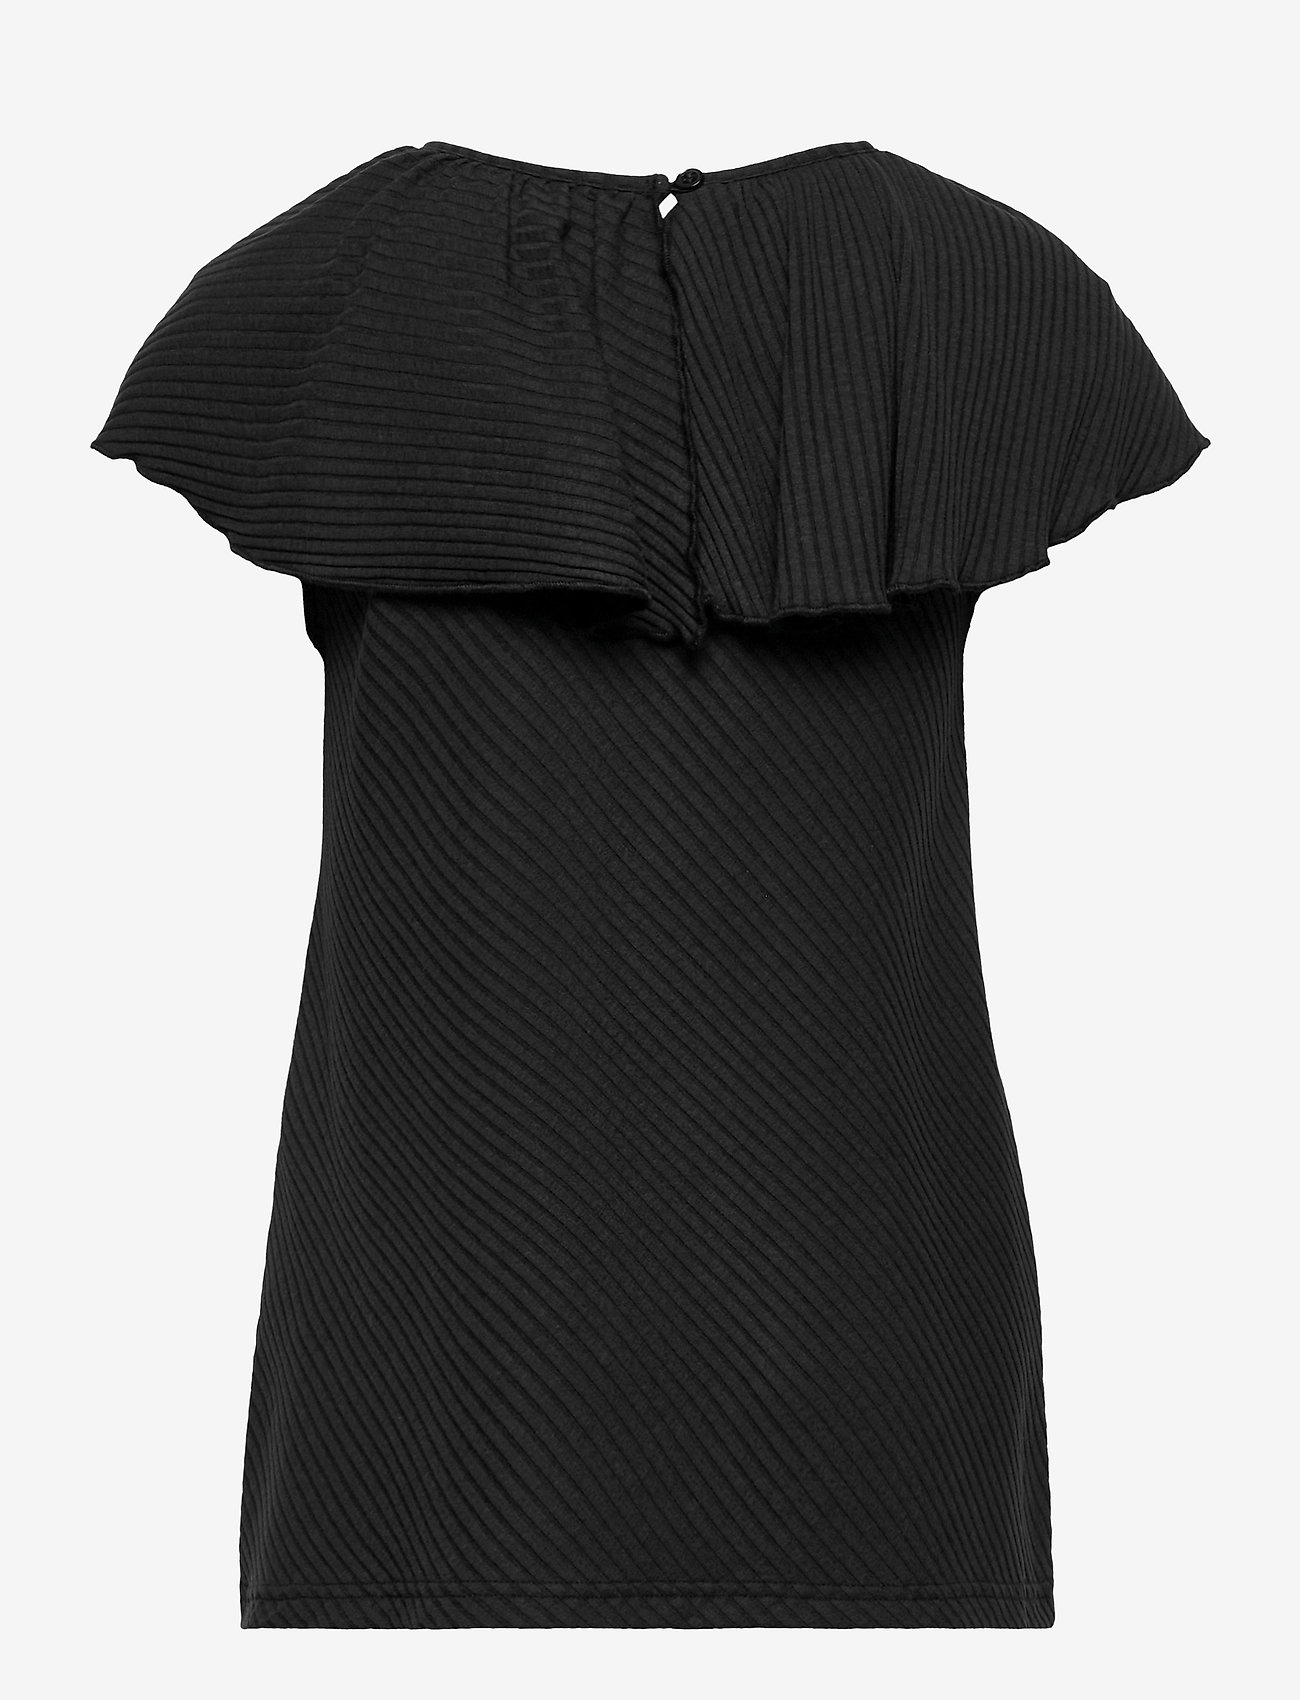 Papu - Tide shirt diagonal rib - zonder mouwen - black - 1